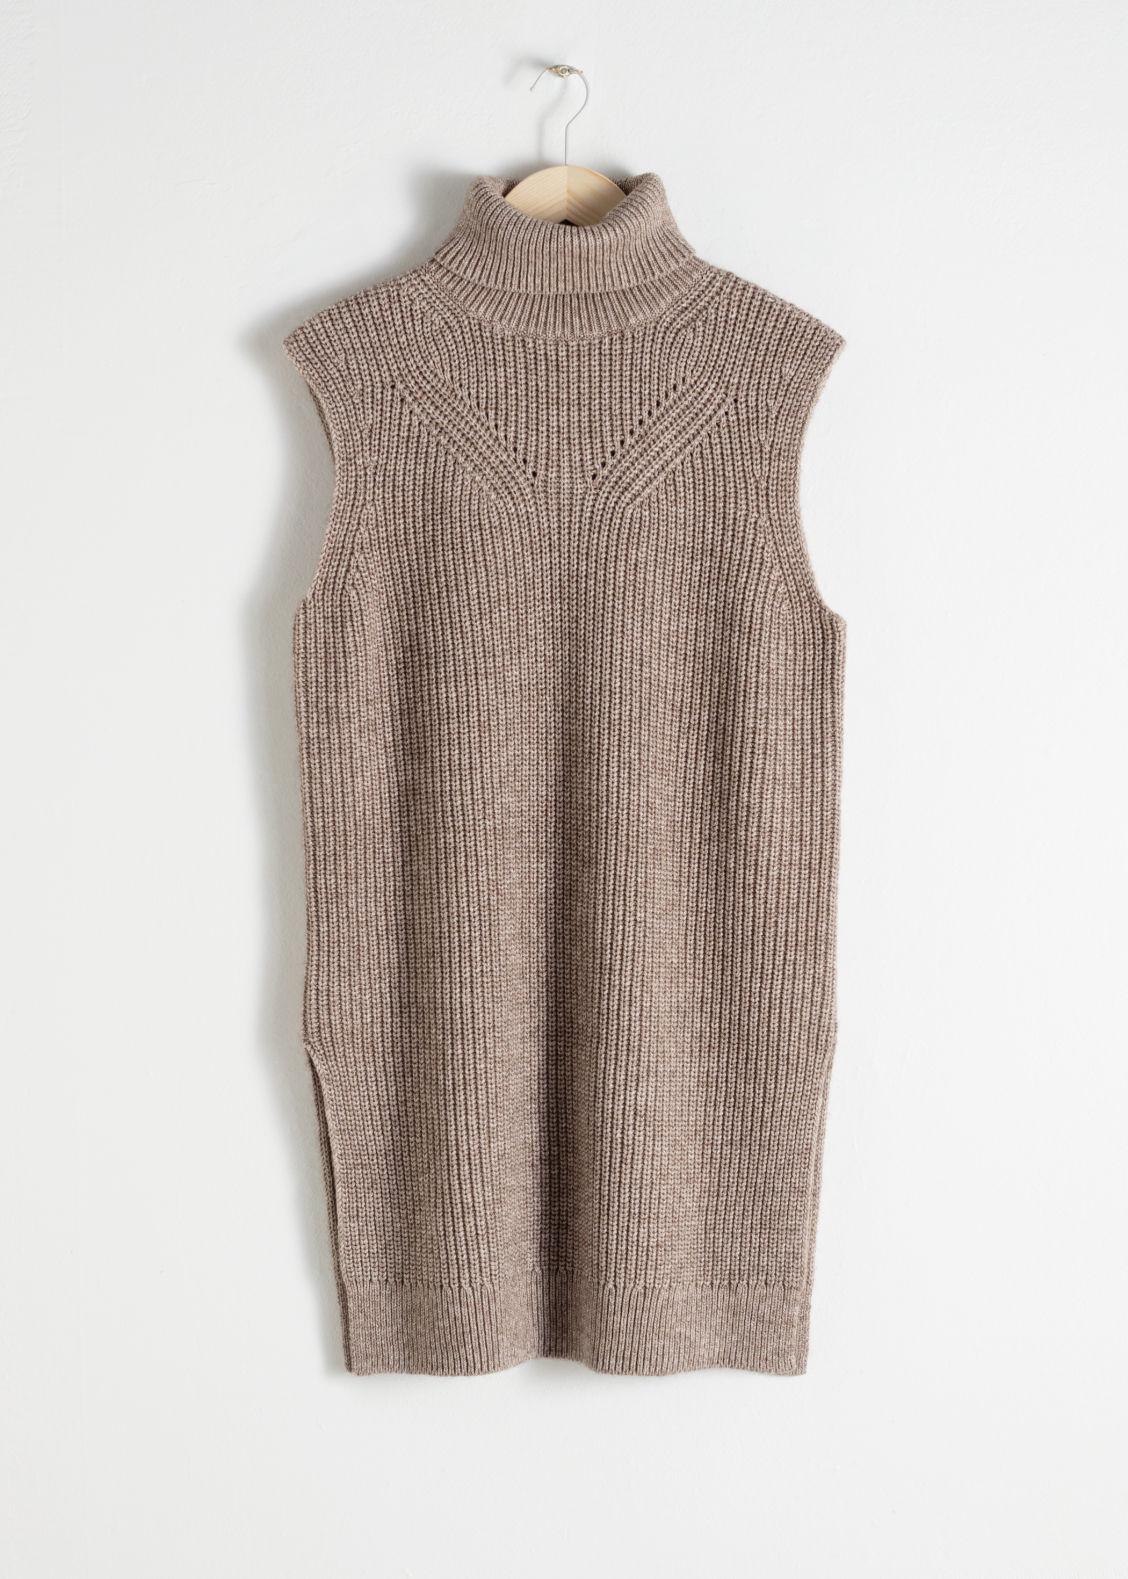 09a4a0f6714356 Cotton Blend Knit Turtleneck Vest - Beige - Turtlenecks - & Other ...